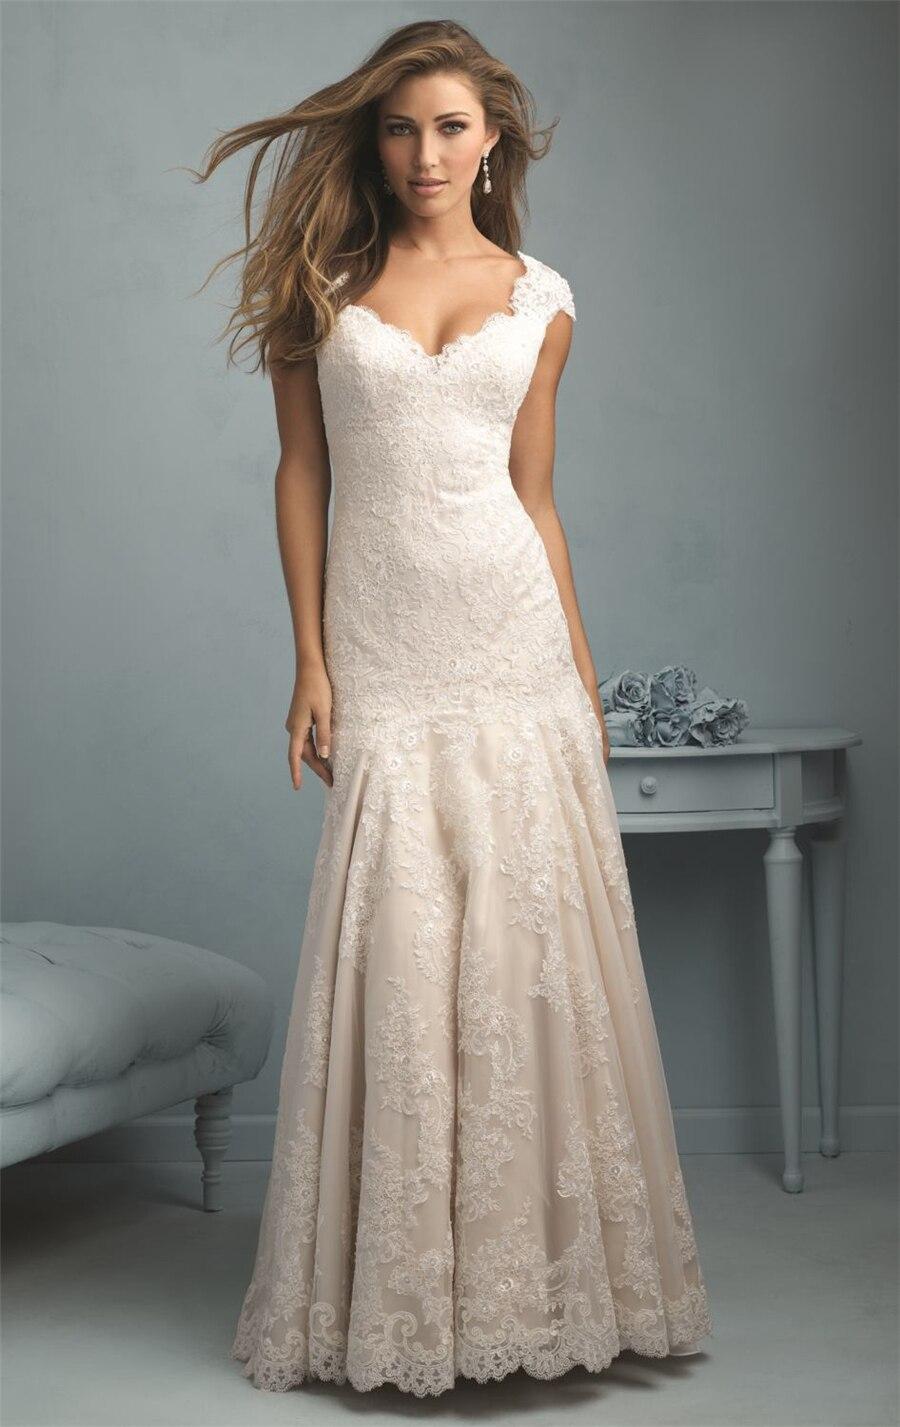 Vintage Mermaid Long Lace Wedding Dresses Ivory/white 2015 Cheap Backless Court Train Plus Size Formal Bridal Dress UD_110